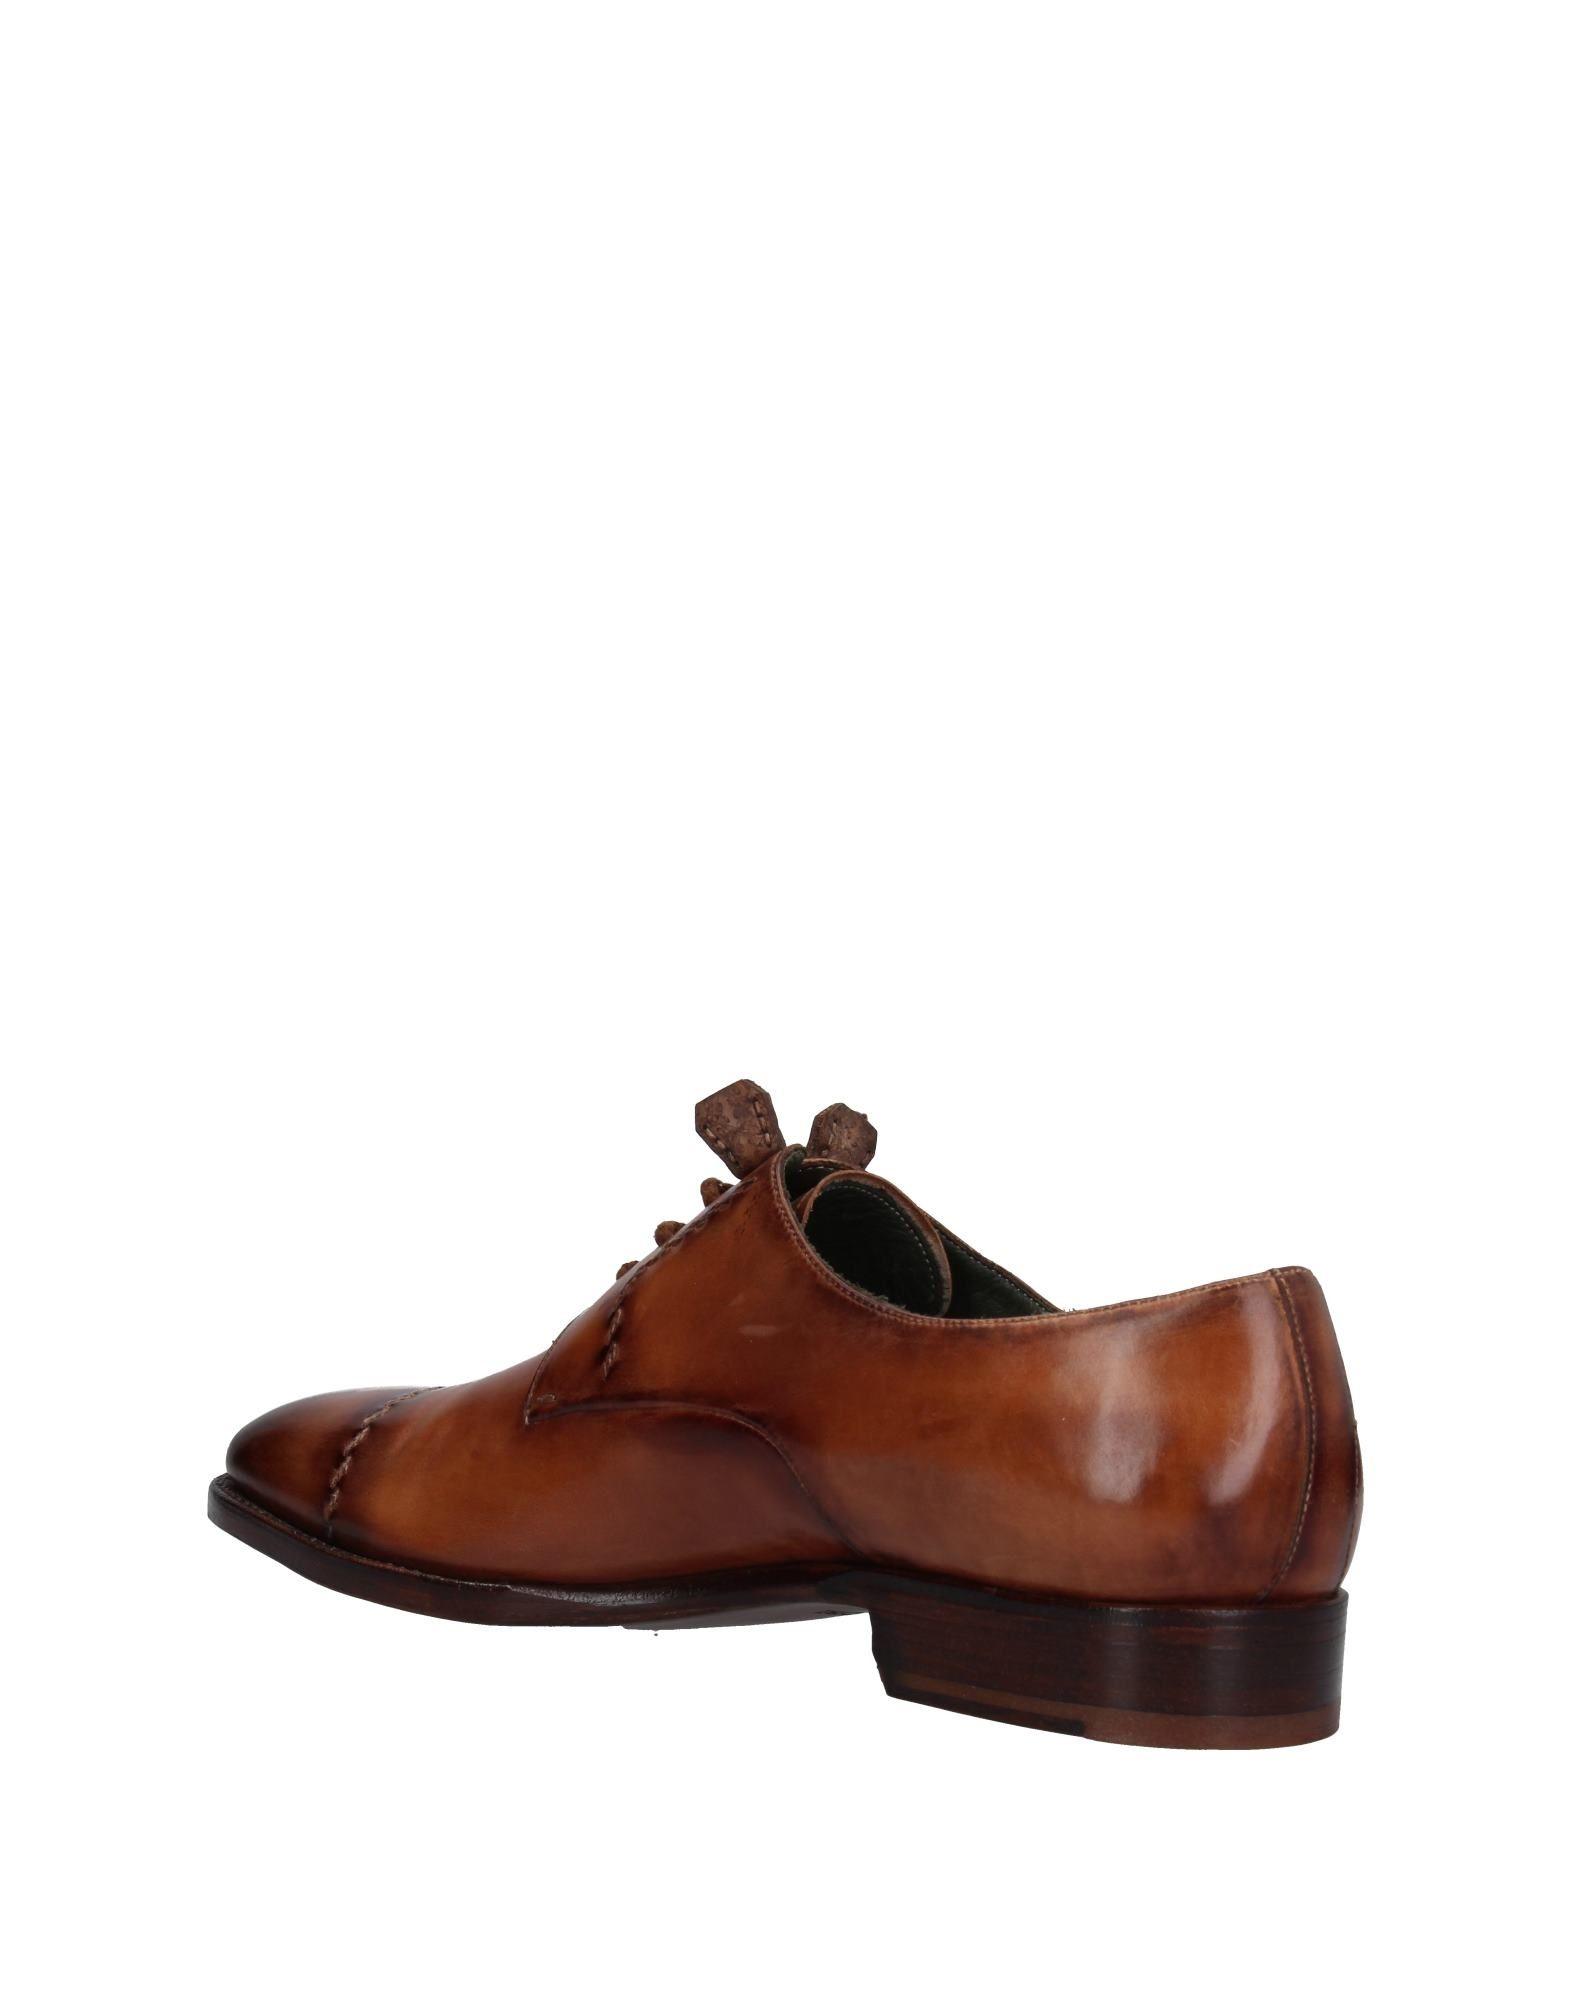 CHAUSSURES - Chaussures à lacetsZenobi 4QkXYWI4cG